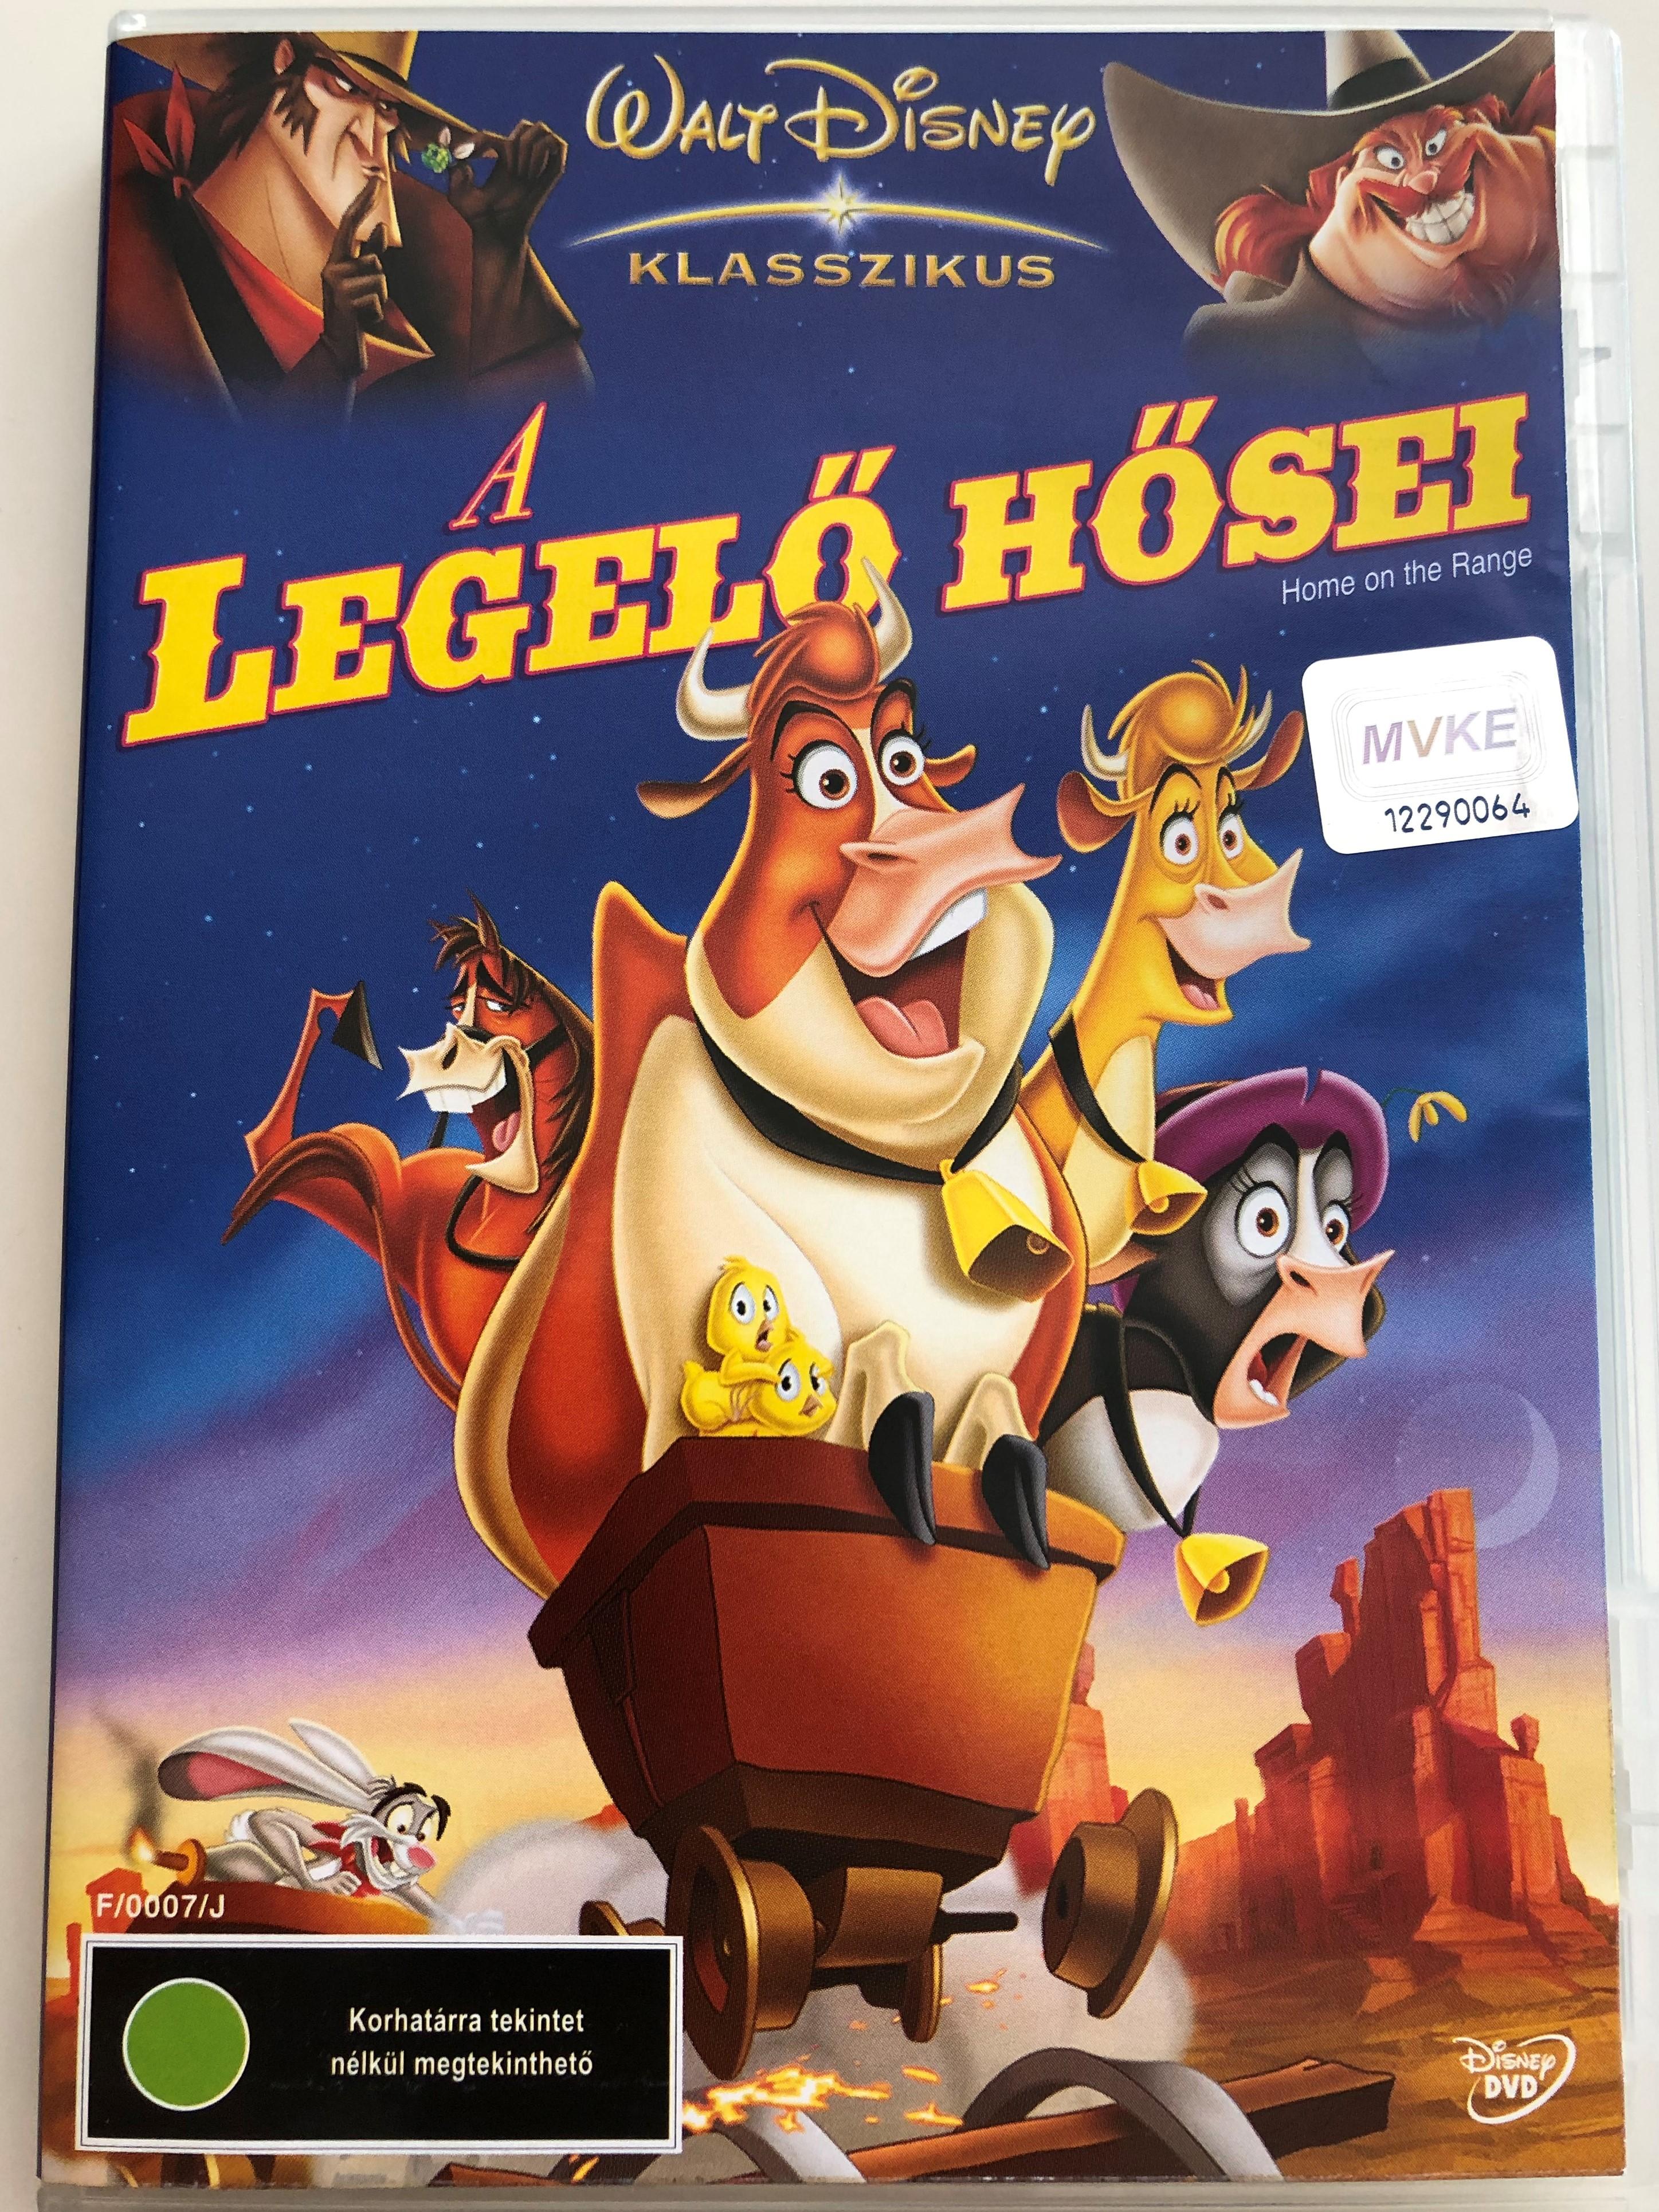 home-on-the-range-dvd-2004-a-legel-h-sei-directed-by-will-finn-john-sanford-starring-roseanne-barr-judi-dench-jennifer-tilly-cuba-gooding-jr.-randy-quaid-steve-buscemi-1-.jpg